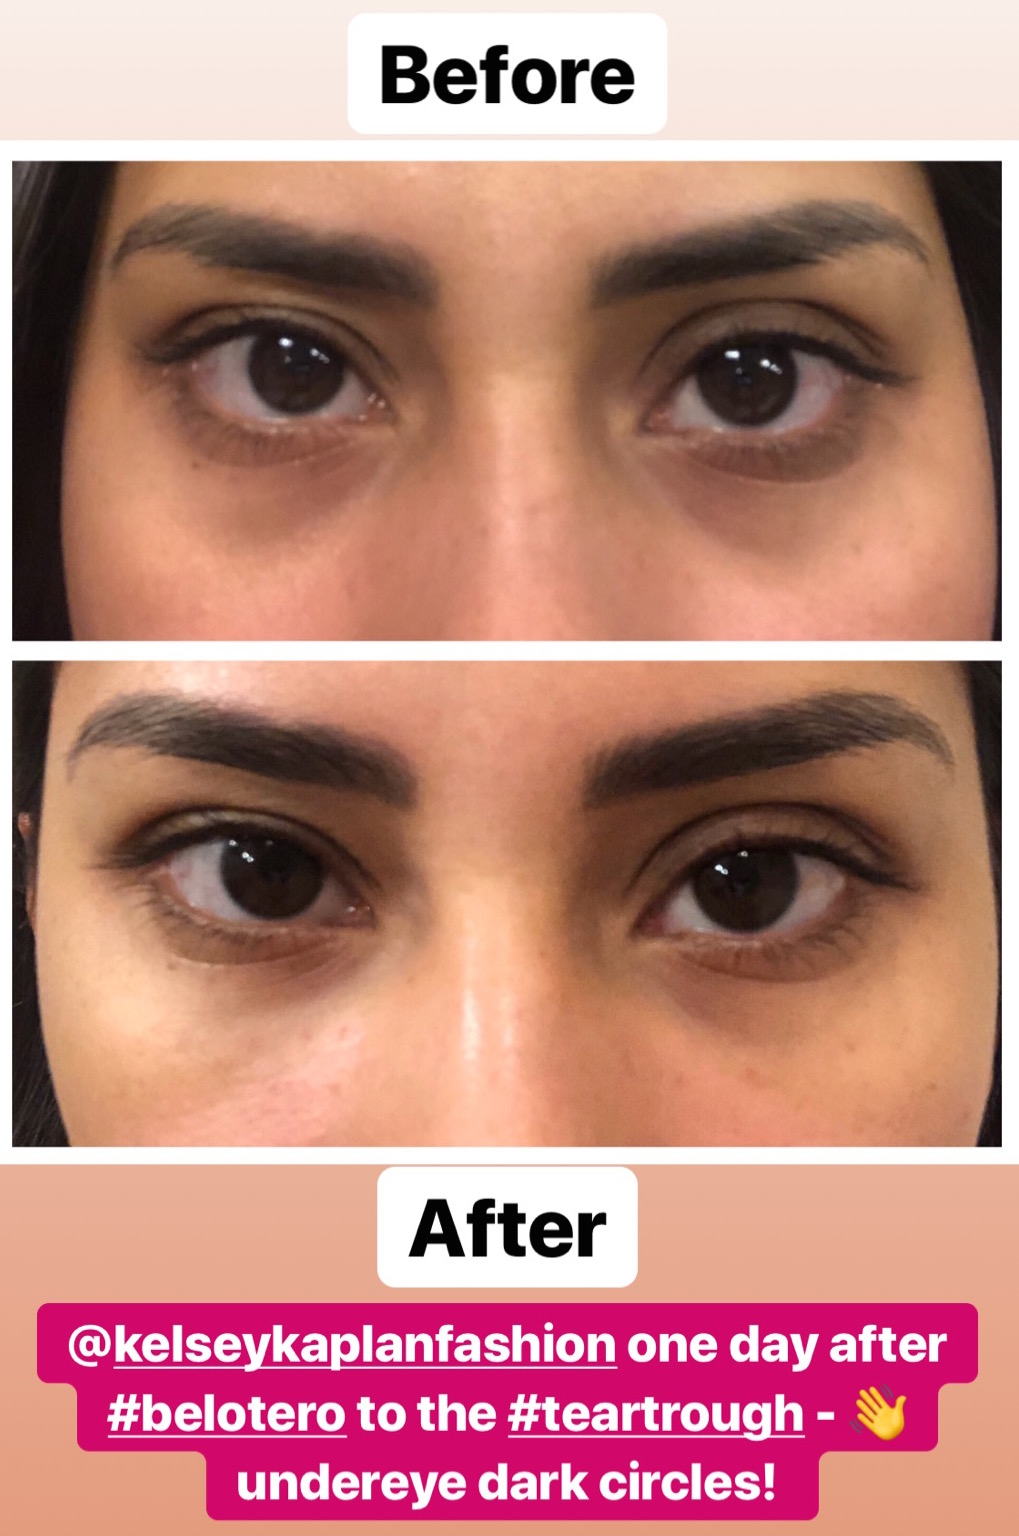 Treatment for undereye dark circles video | BuildMyBod ...